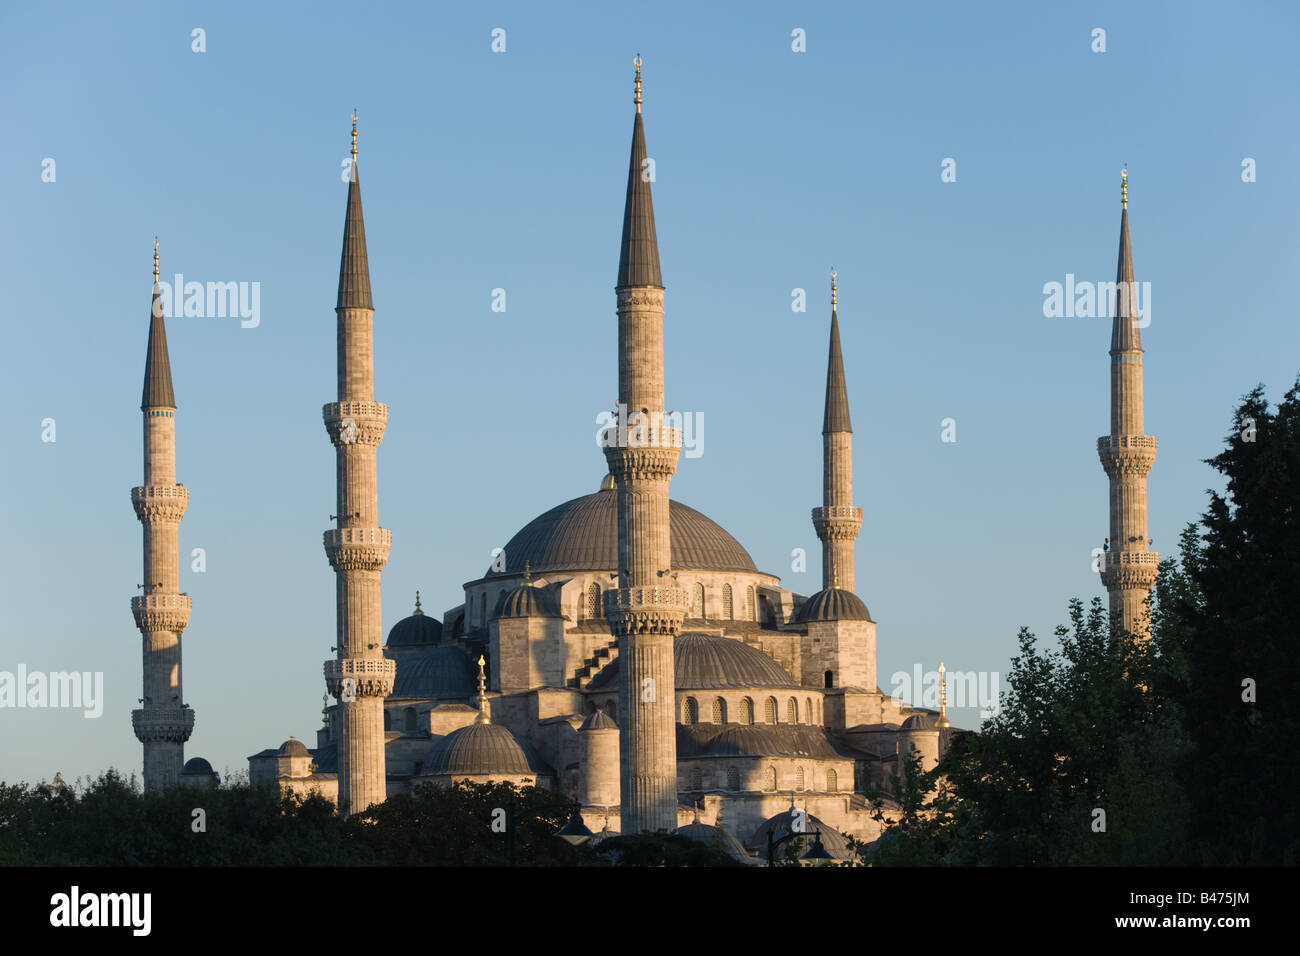 La mezquita Azul de Estambul Imagen De Stock